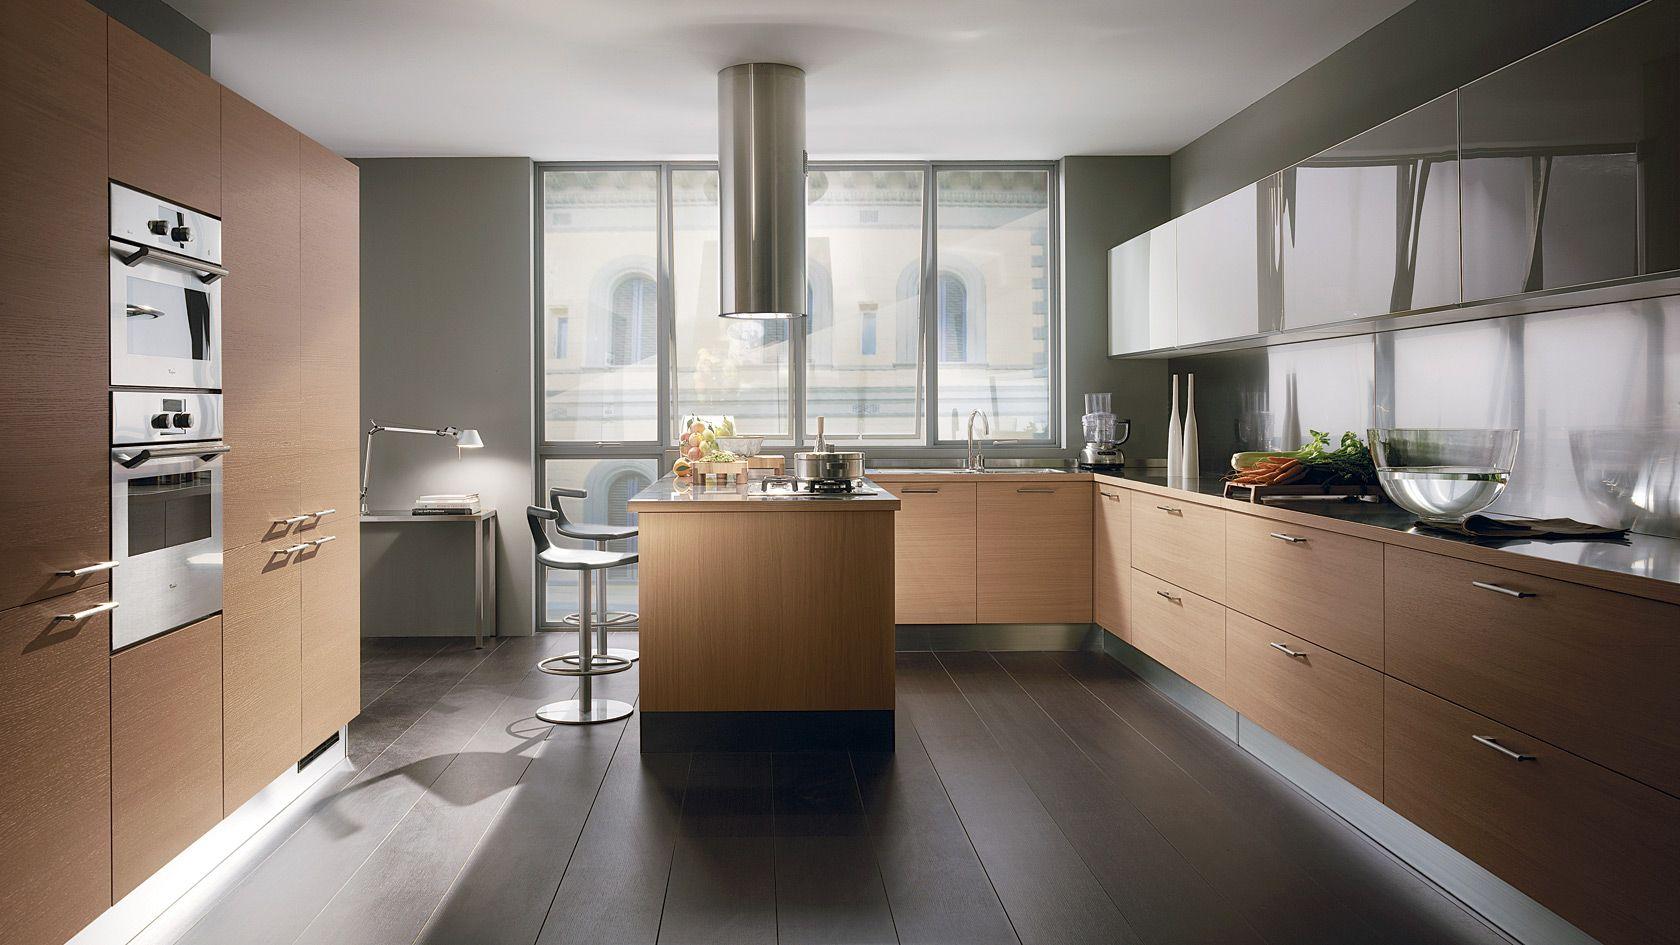 scavolini mood kitchen light scavolini contemporary kitchen. Scavolini · Contemporary Kitchen Mood Light T